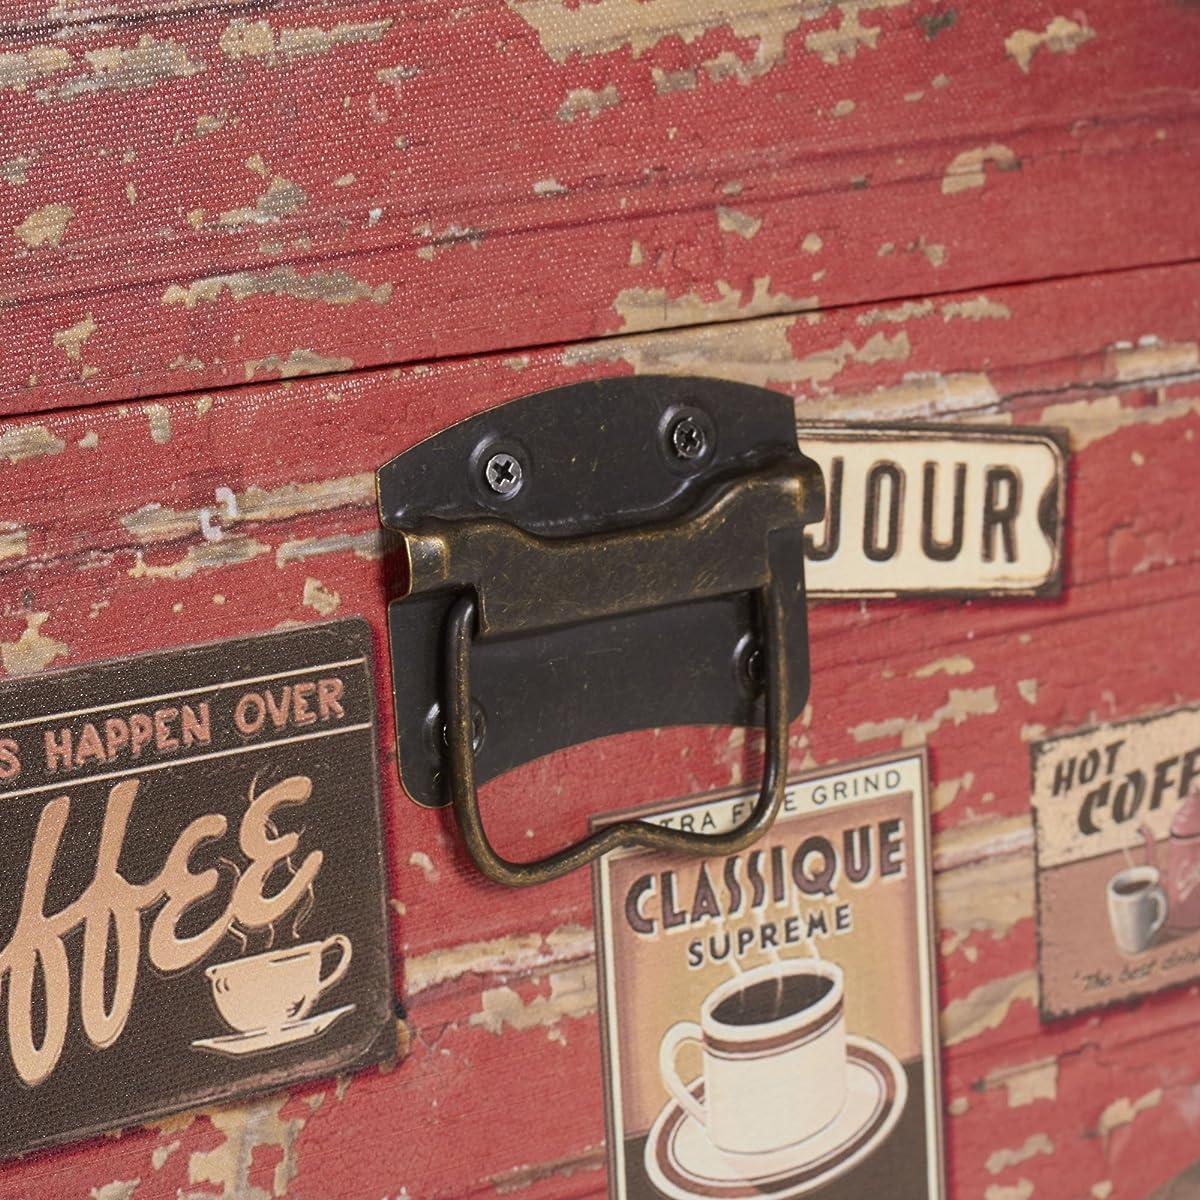 Household Essentials 9245-1 Medium Decorative Home Storage Trunk - Luggage Style - Coffee Shop Design